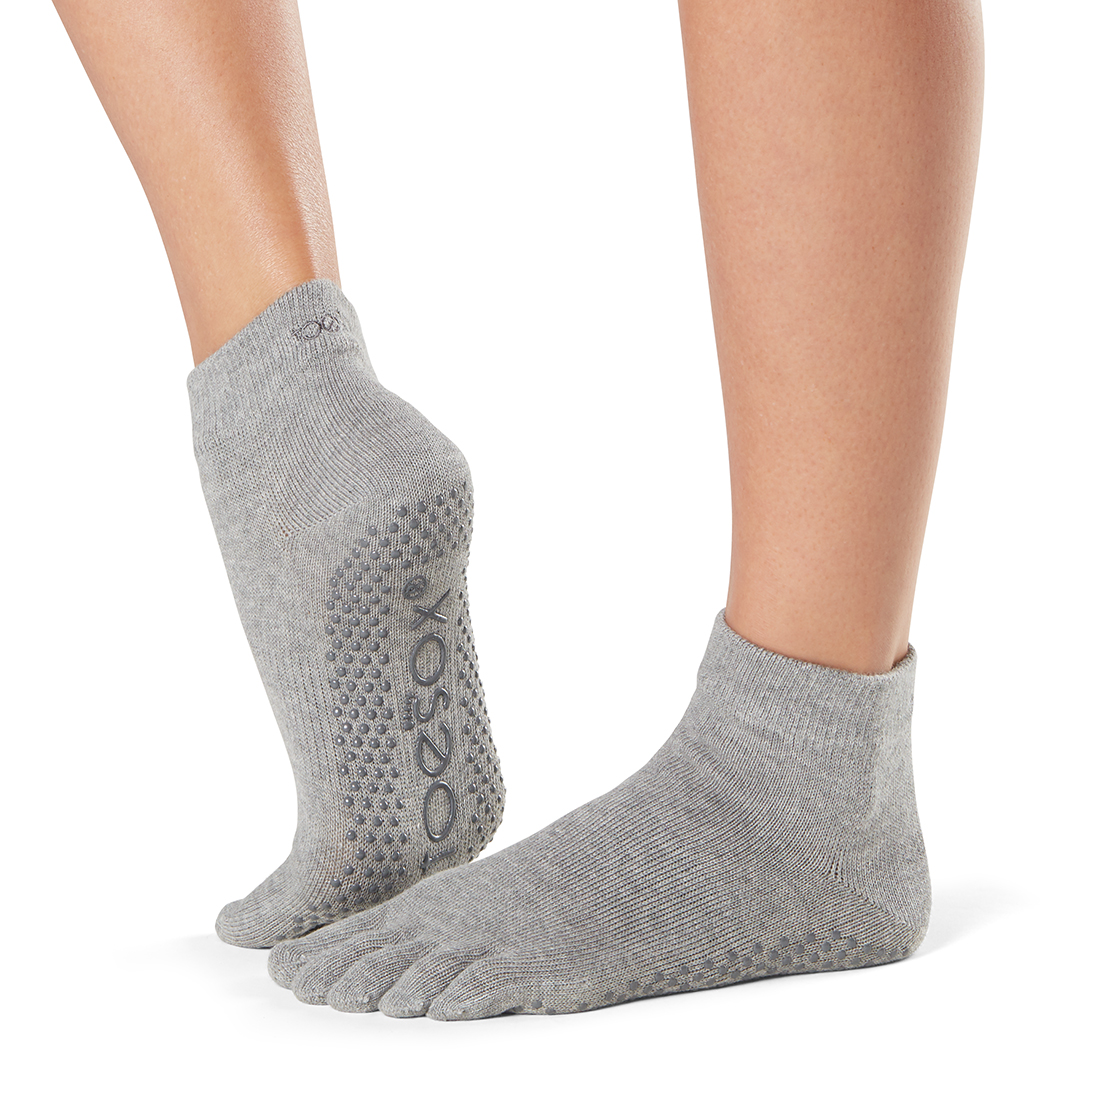 Yogasocken ToeSox Ankle Full Toe Heather Grey - 1